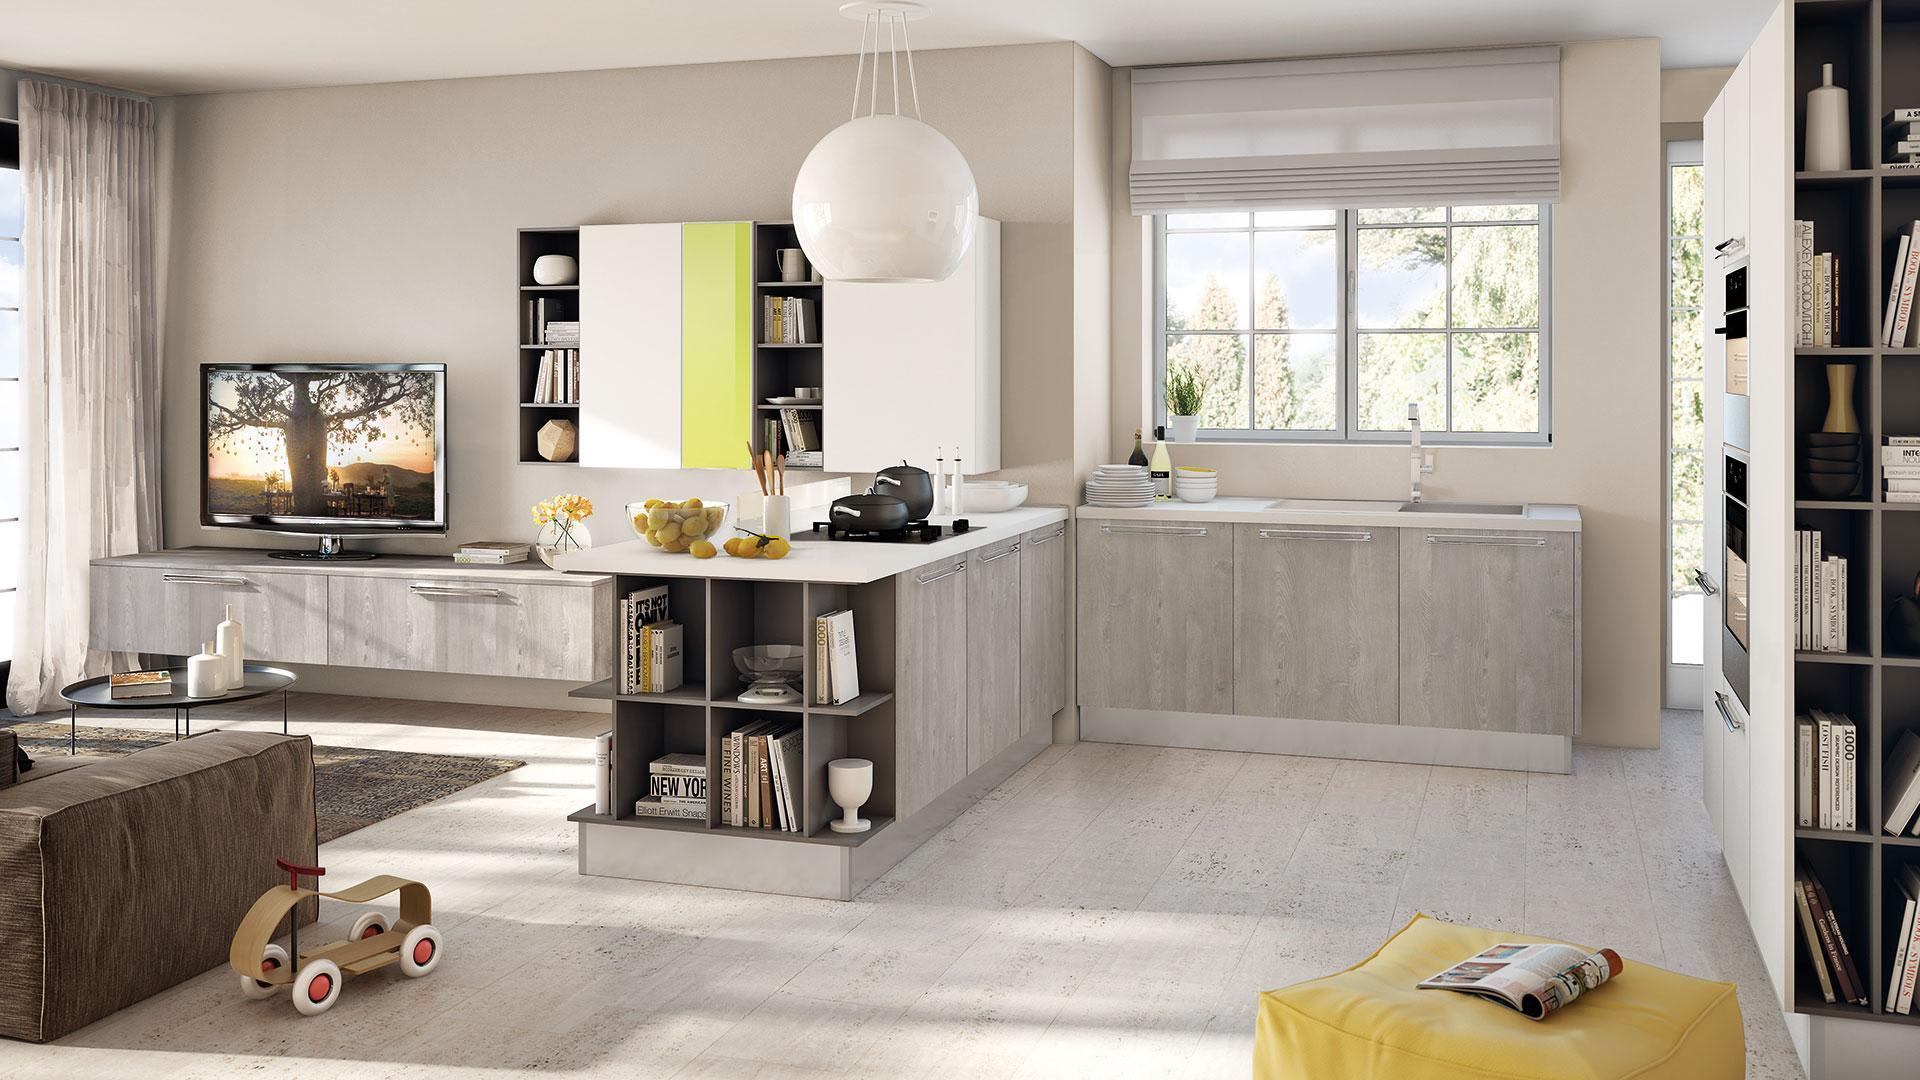 Beautiful Cucine Ad Angolo Lube Images - harrop.us - harrop.us